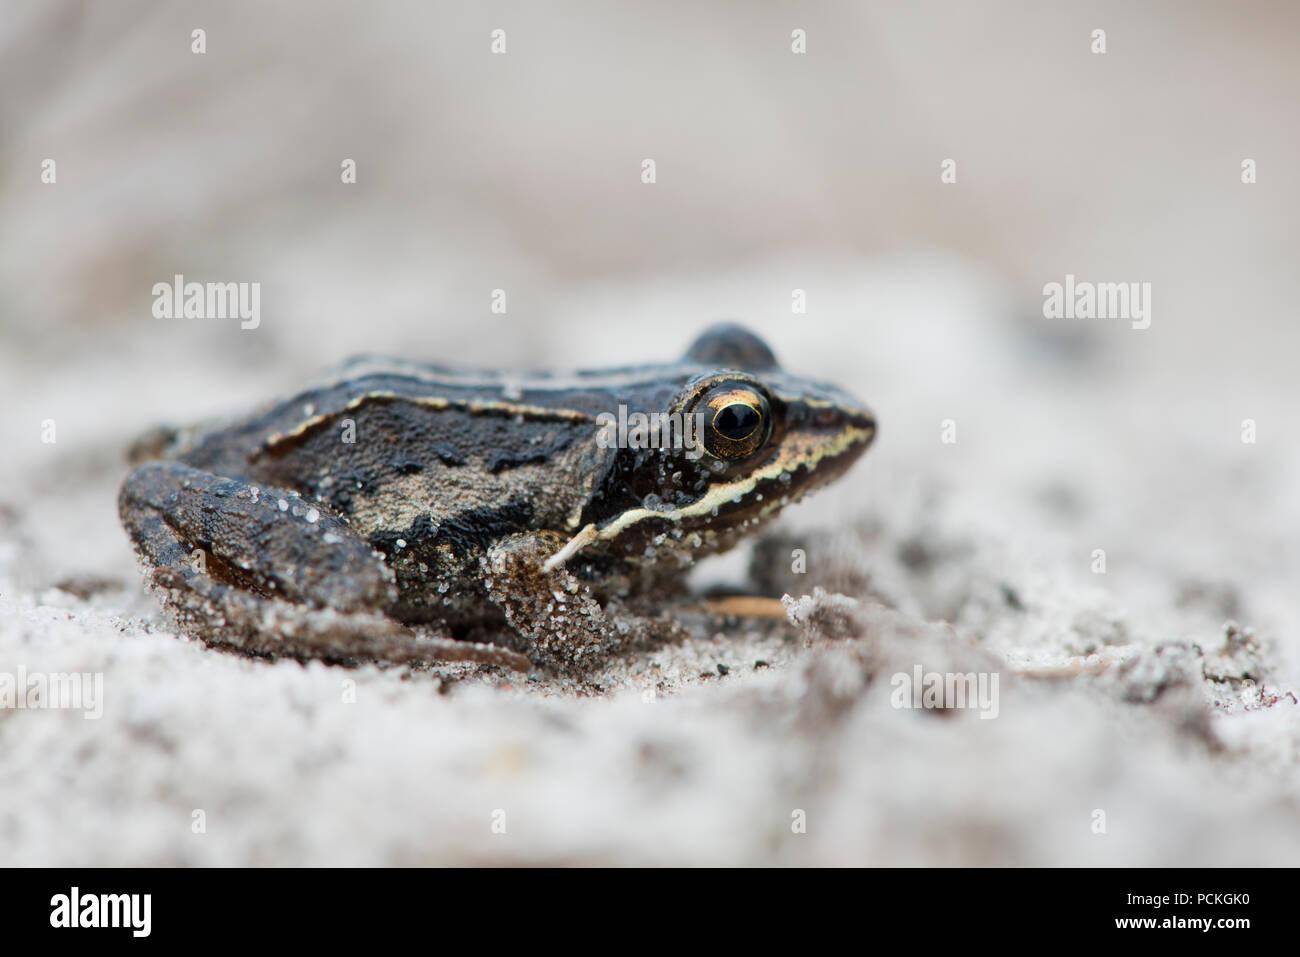 Young Moor frog (Rana arvalis), Emsland, Lower Saxony, Germany - Stock Image